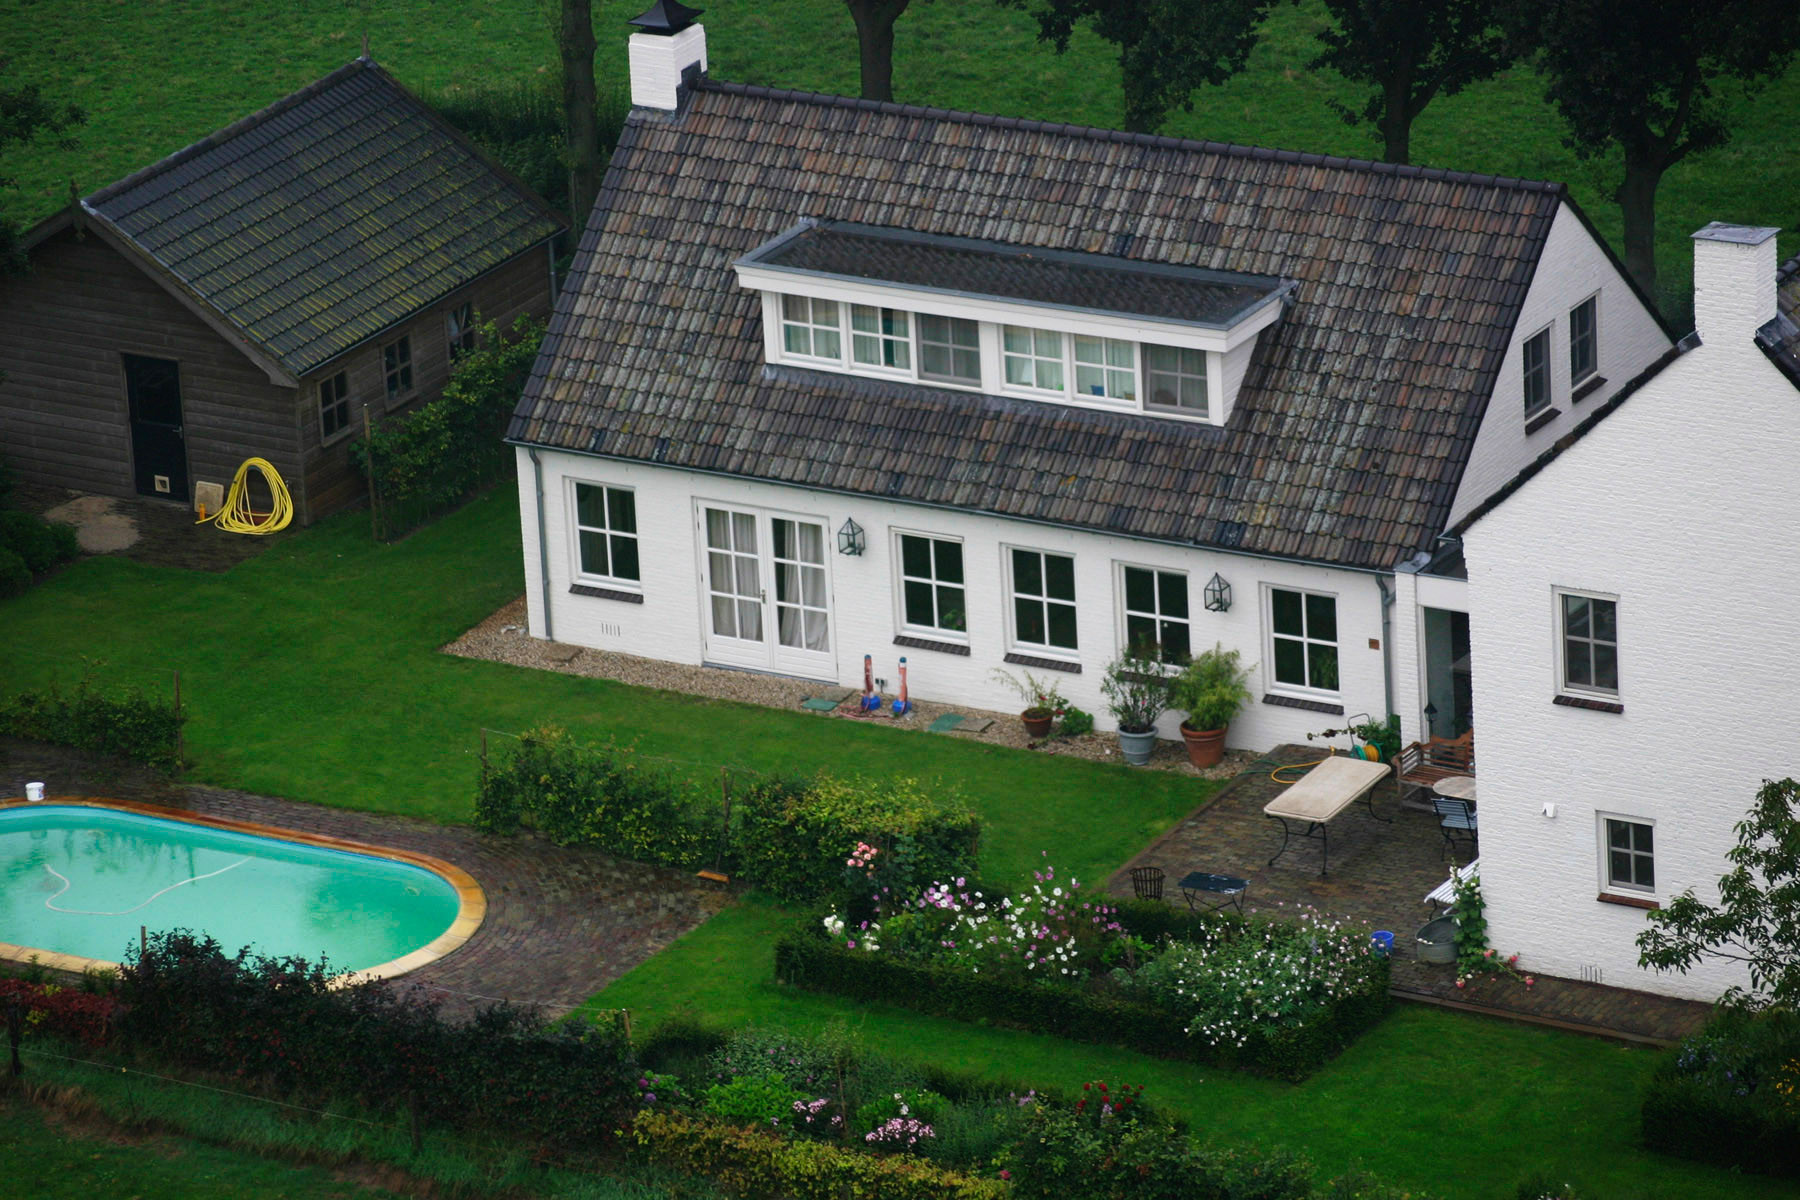 Real Estate - Economy